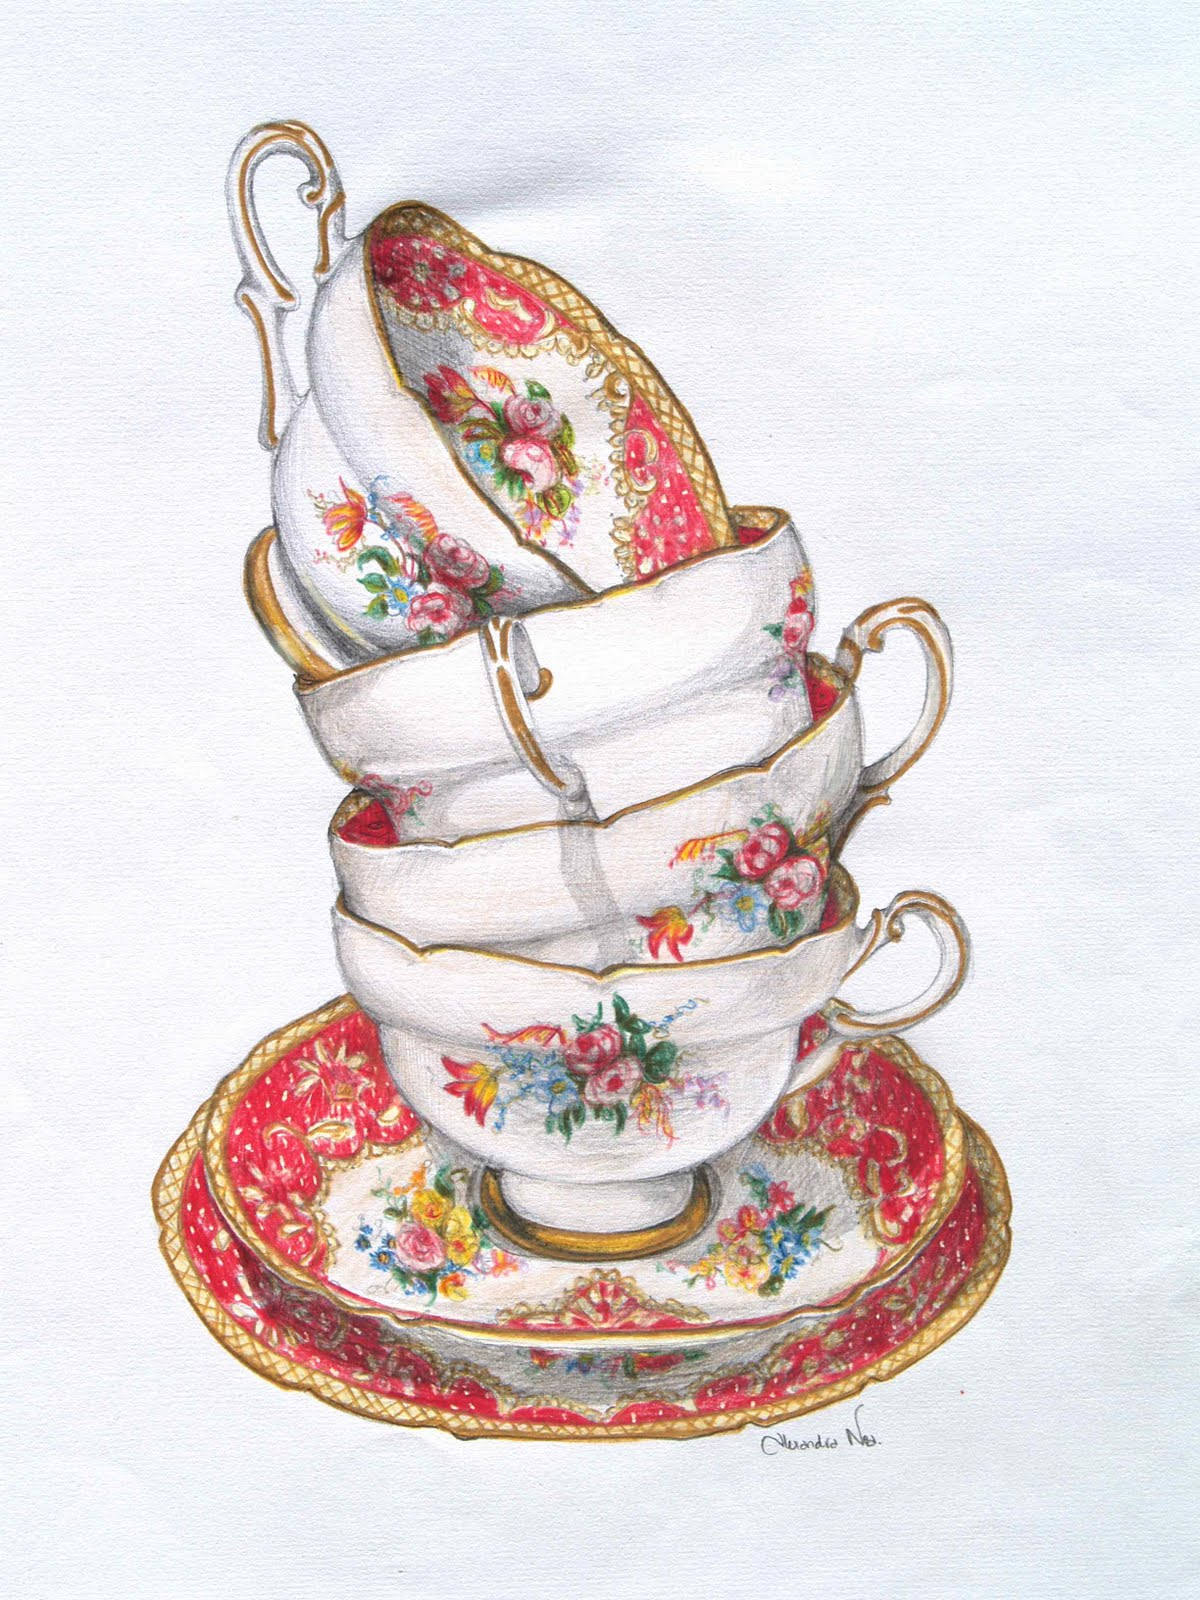 Drawn teacup afternoon tea #4